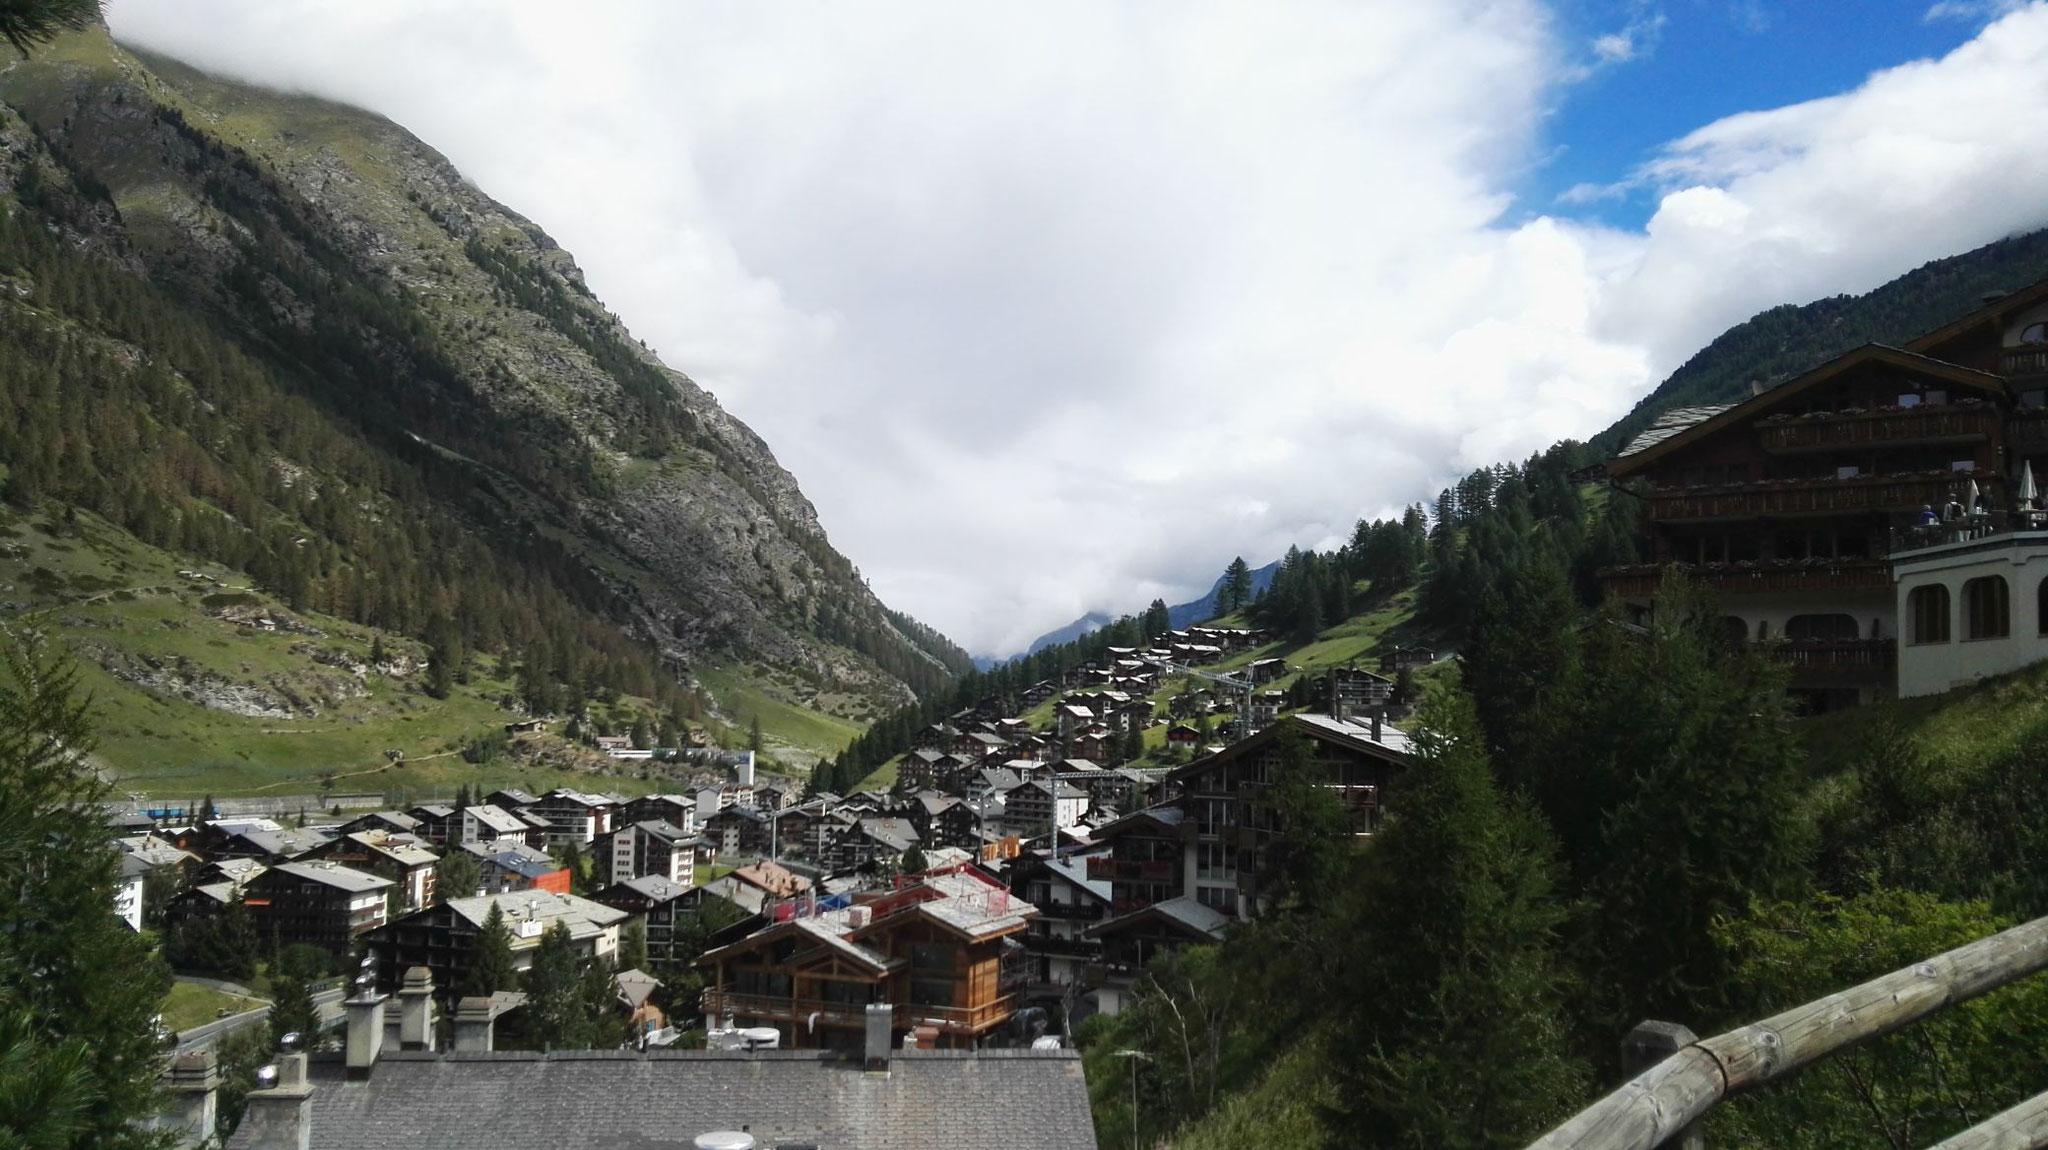 Gornergrat Zermatt Marathon - Zermatt